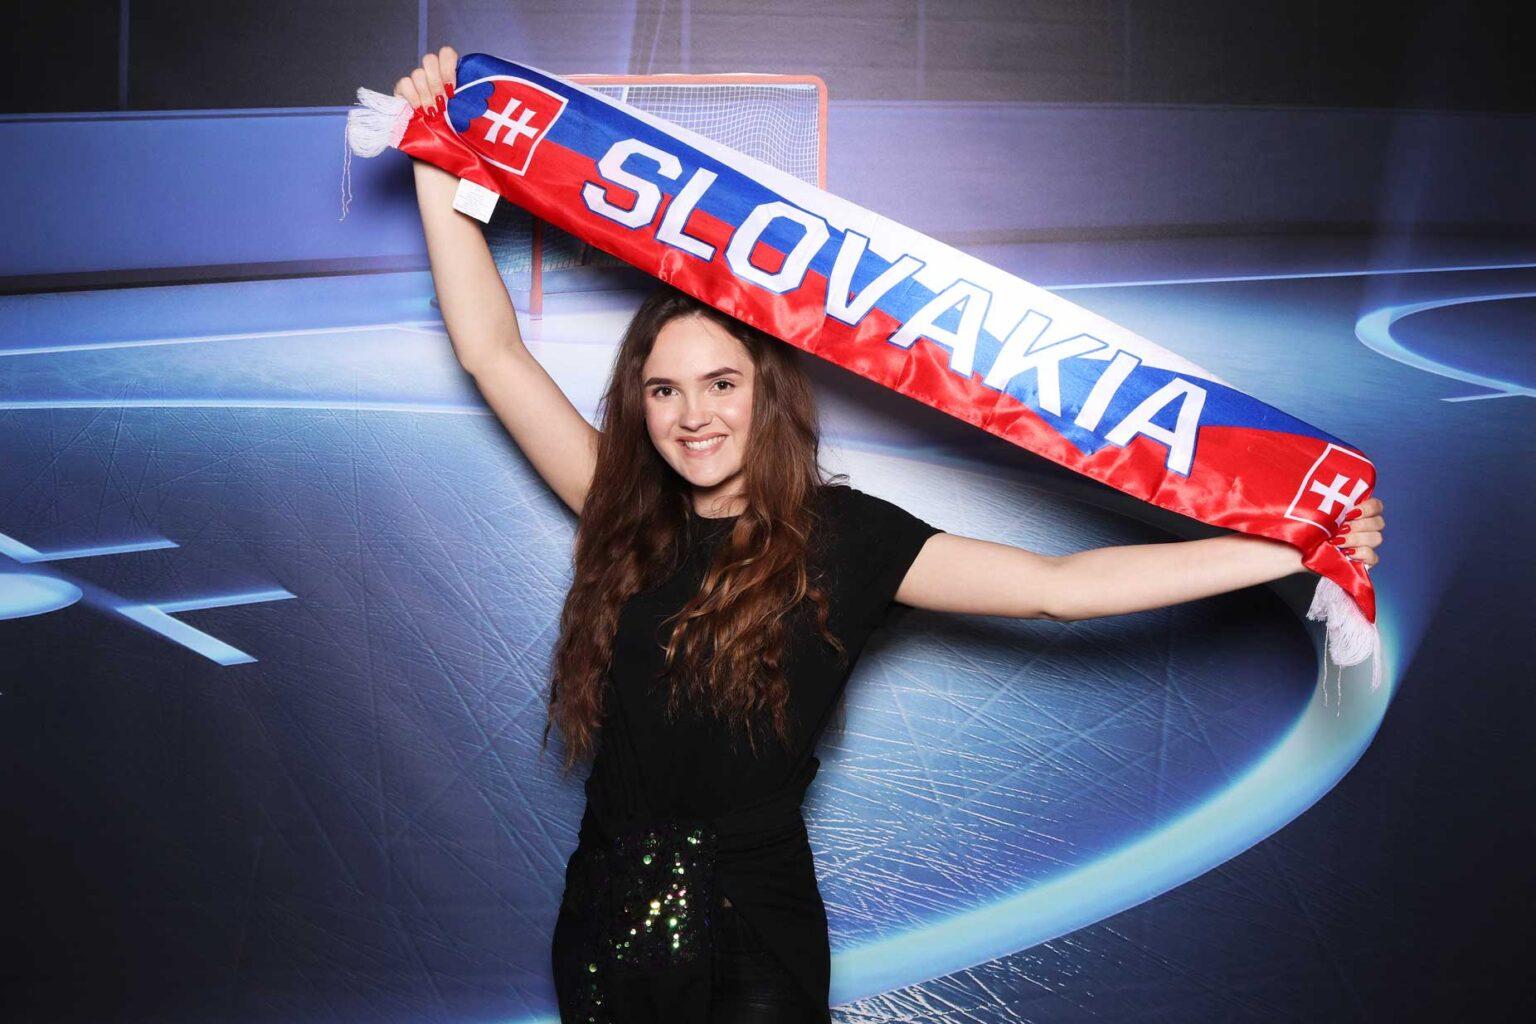 Fotokútik šál Slovensko - fotostena - športový fotobox Žilina.